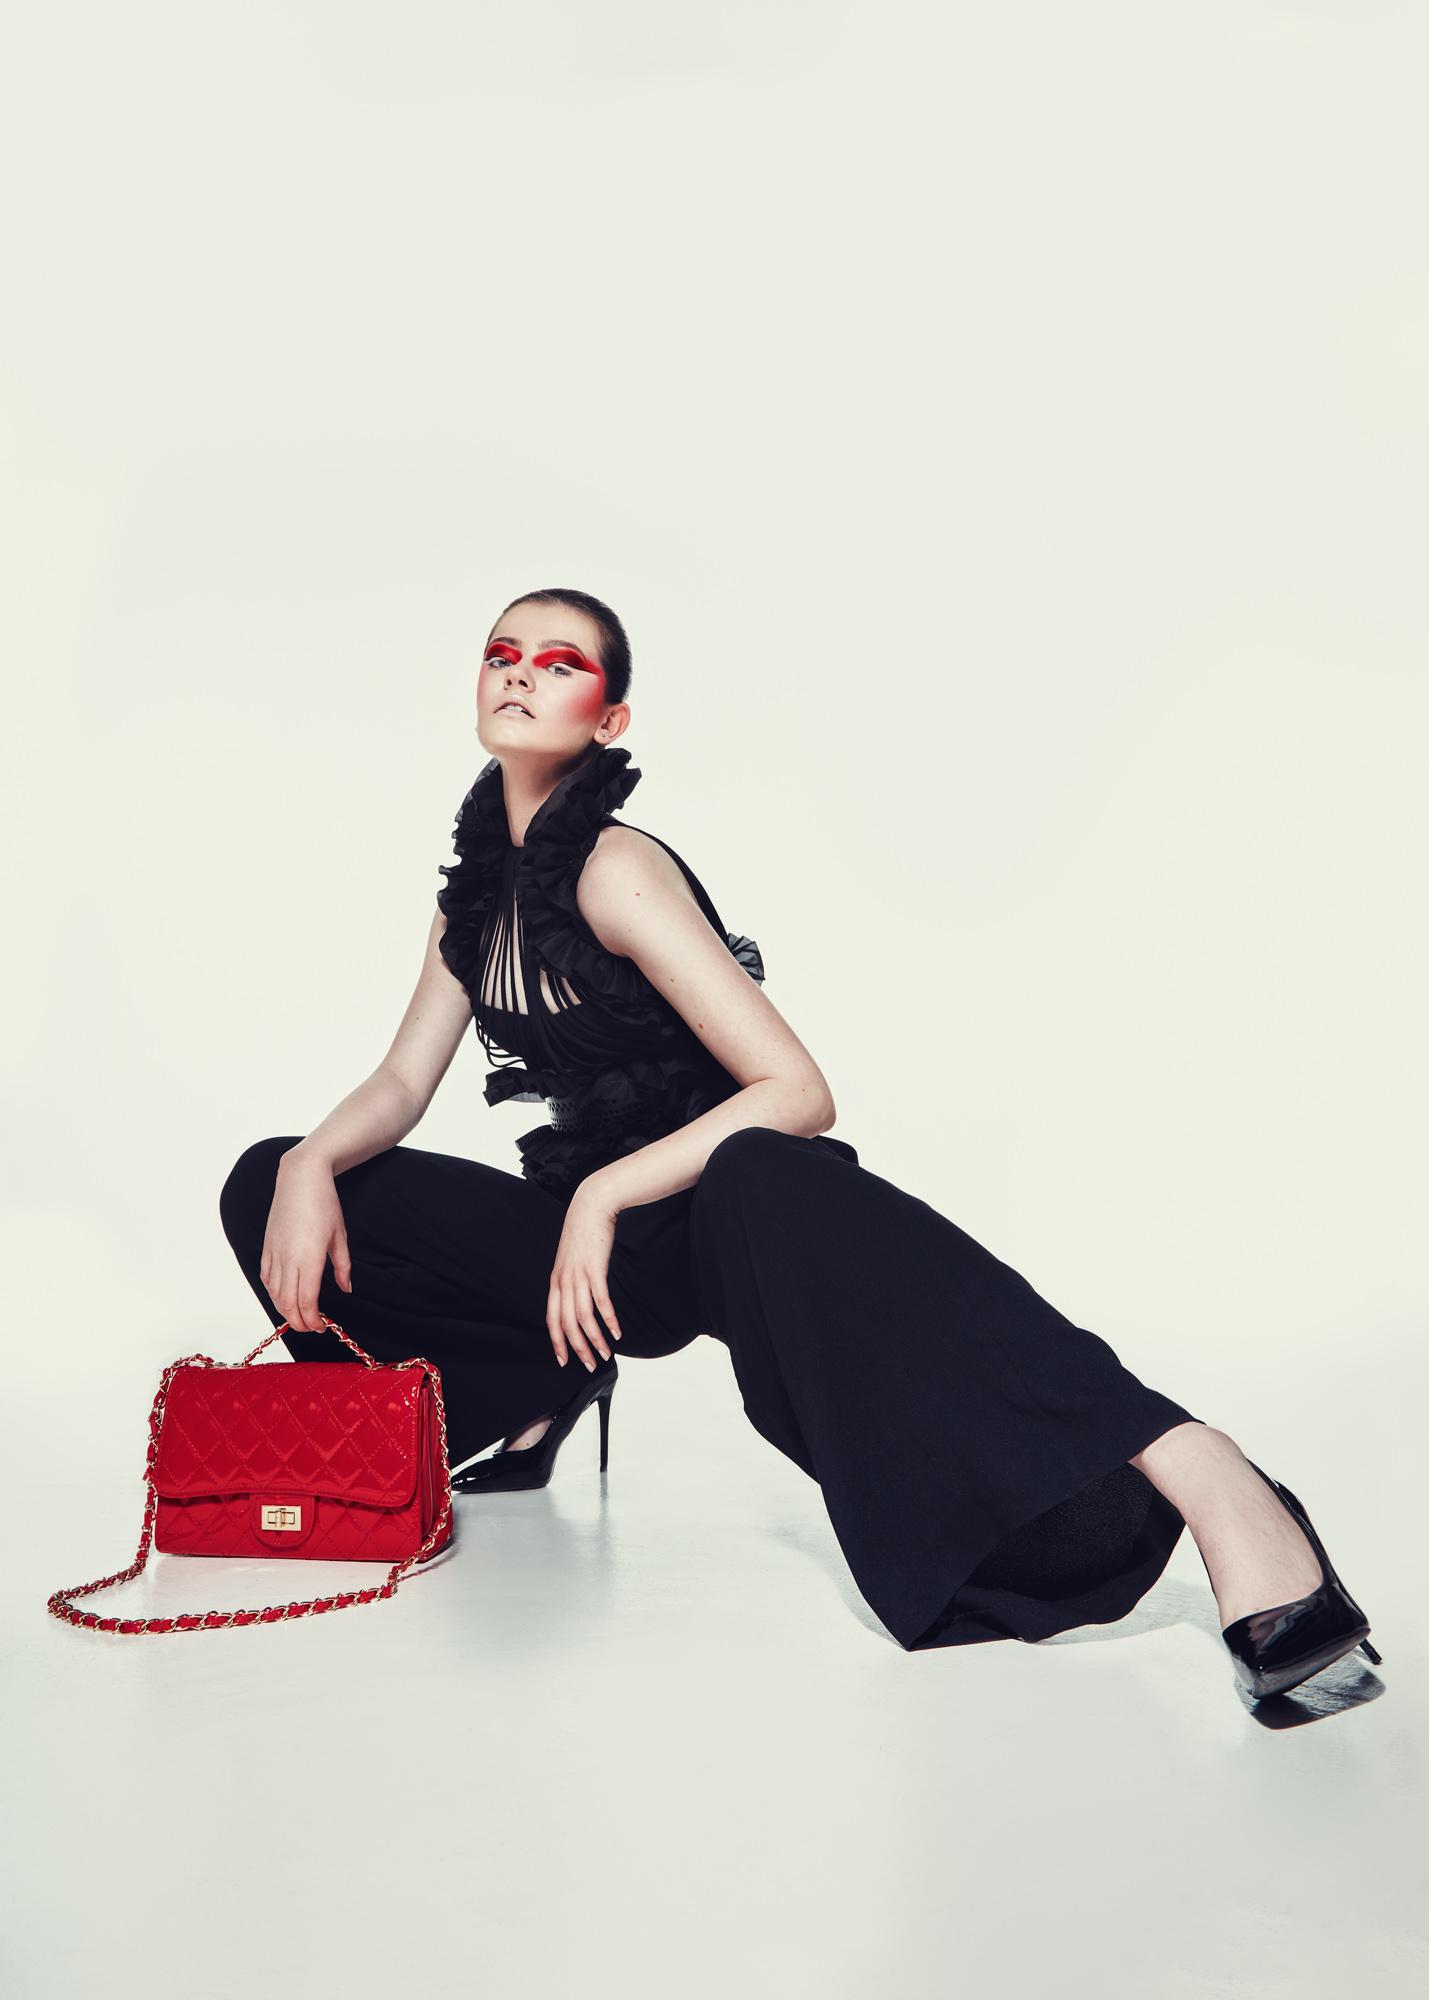 FashionEditorial_Rachael MacDonald.jpg